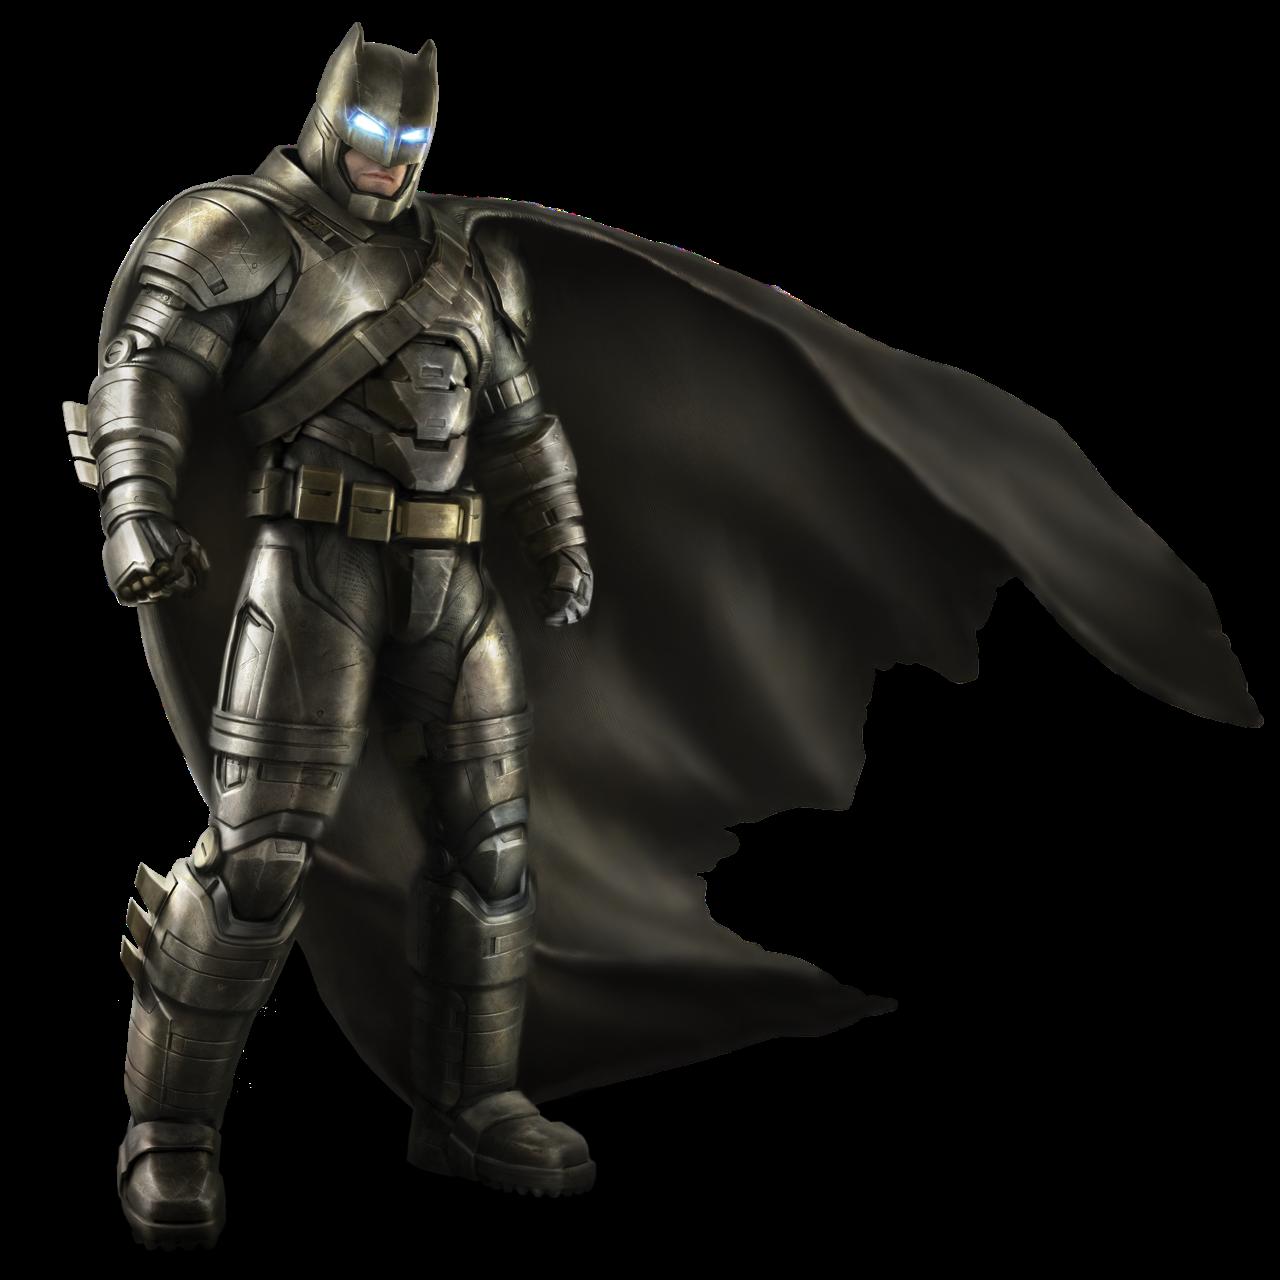 Batman vs superman clipart picture royalty free library Bat man #Clip #Art. ÅWESOMENESS!!!™ ÅÅÅ+ | HERO CLIP ART ... picture royalty free library